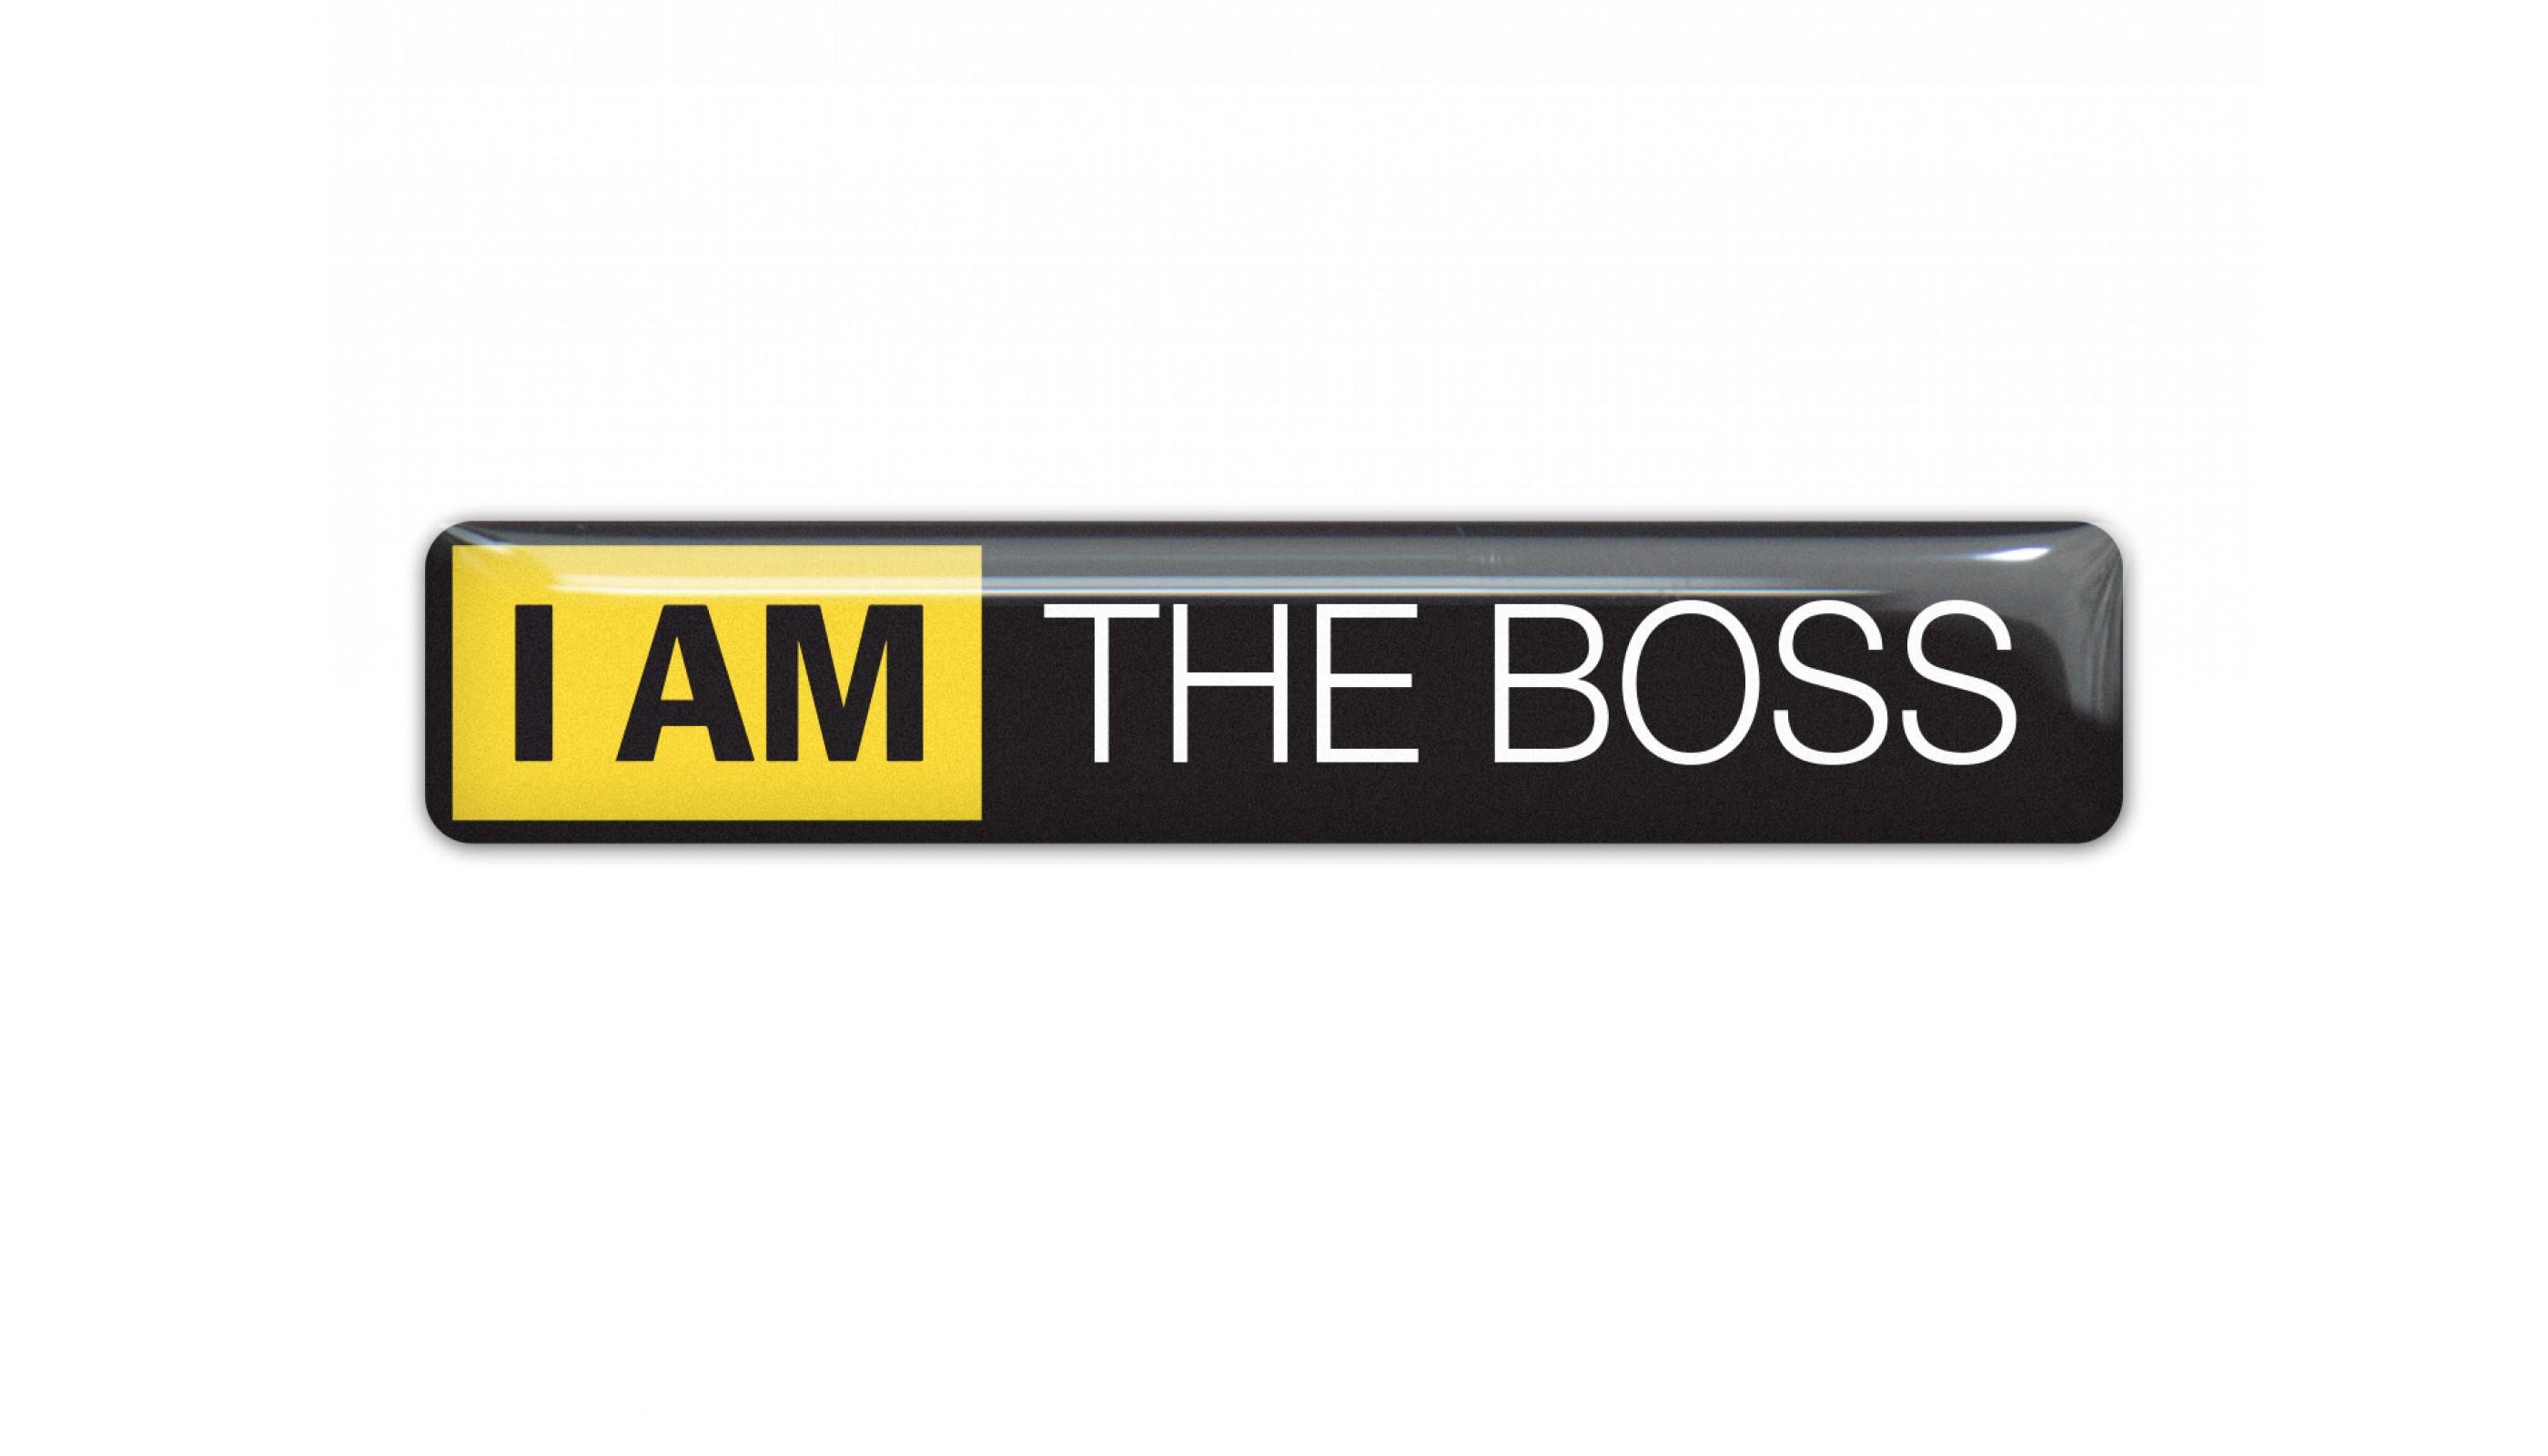 Nikon - Im The Boss